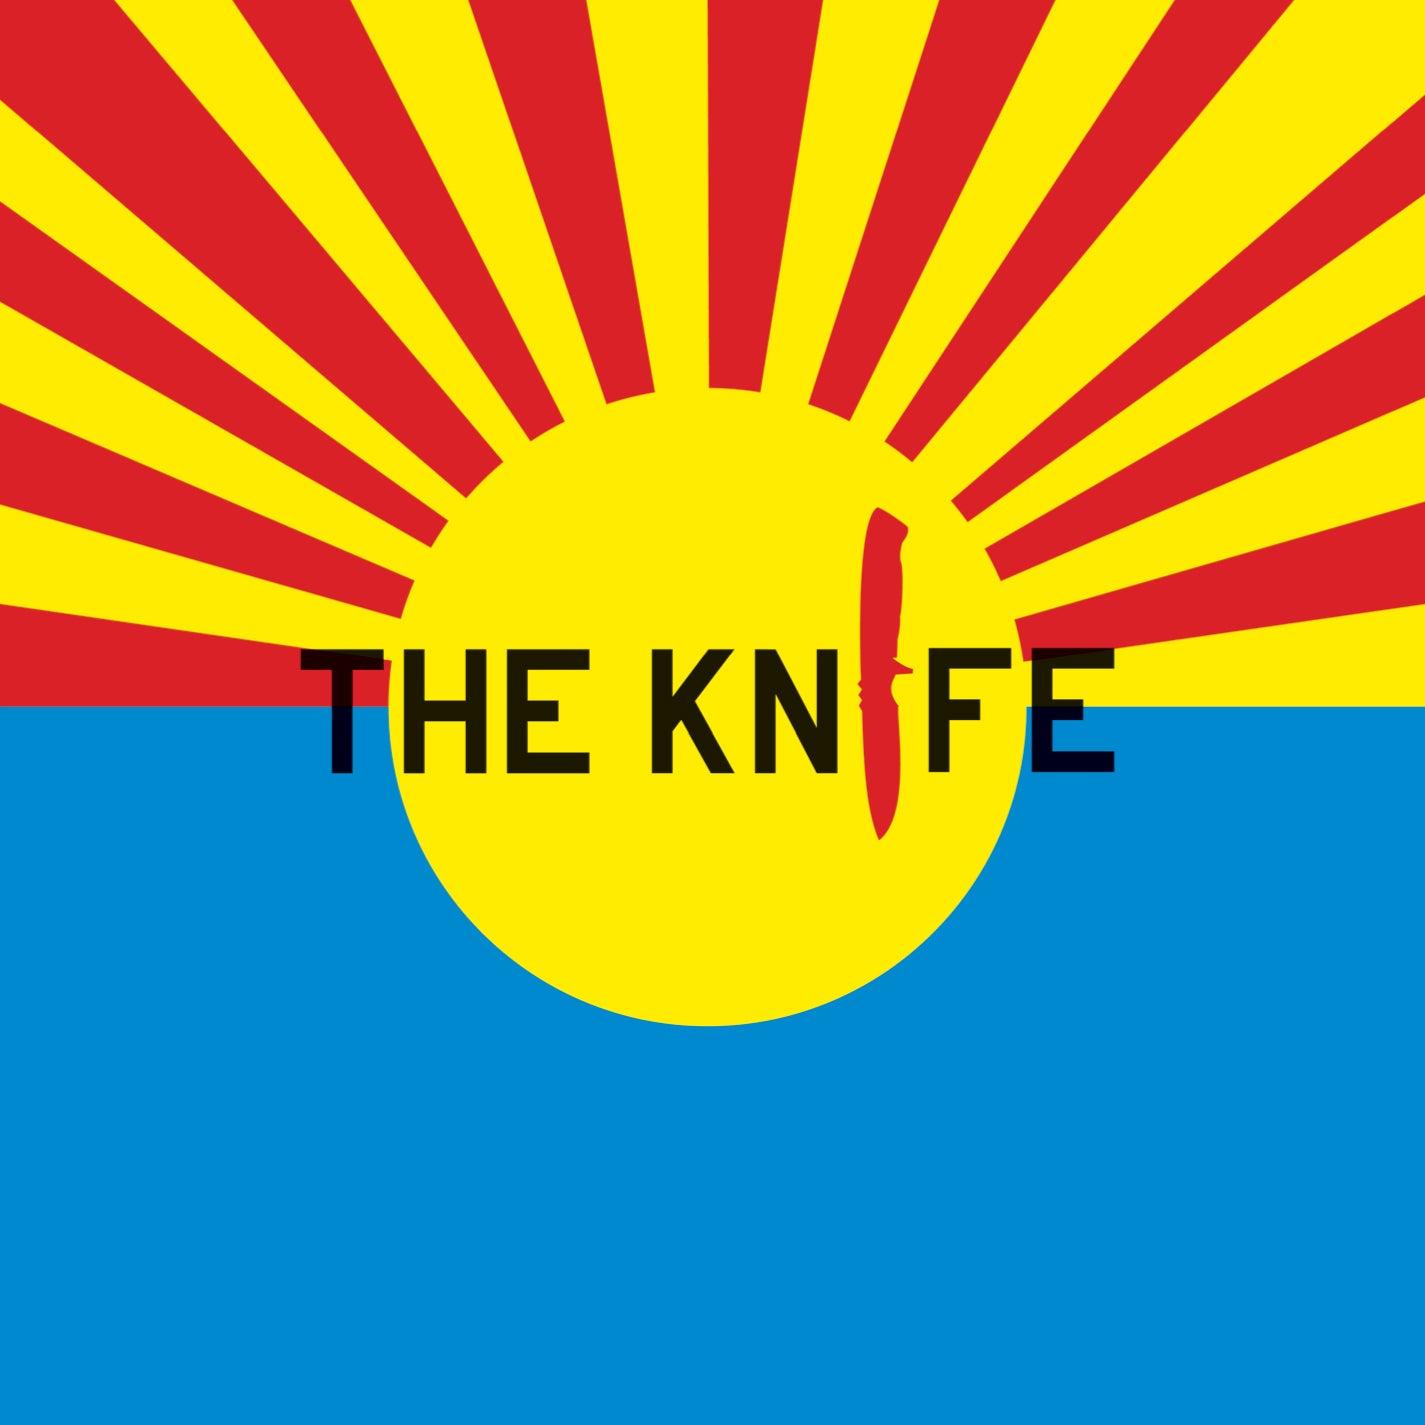 "The Knife 'The Knife' (2x12"" vinyl)"